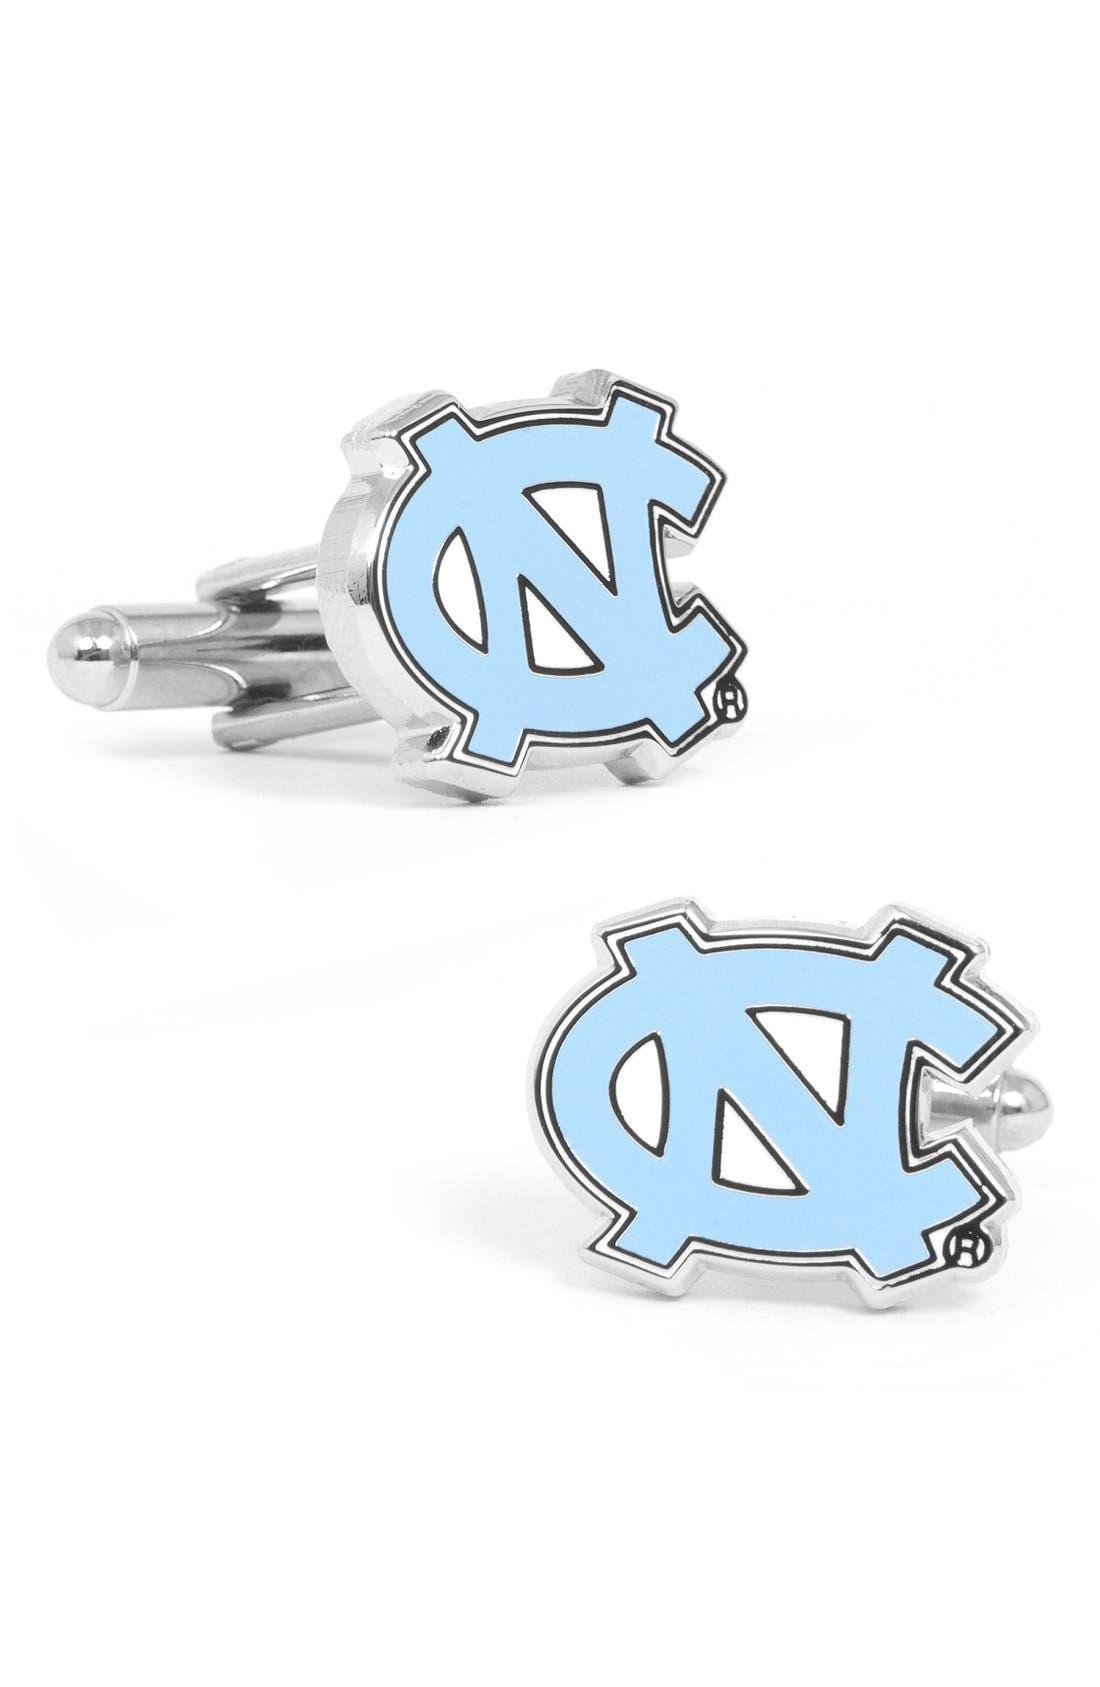 'University of North Carolina Tar Heels' Cuff Links,                             Main thumbnail 1, color,                             BLUE